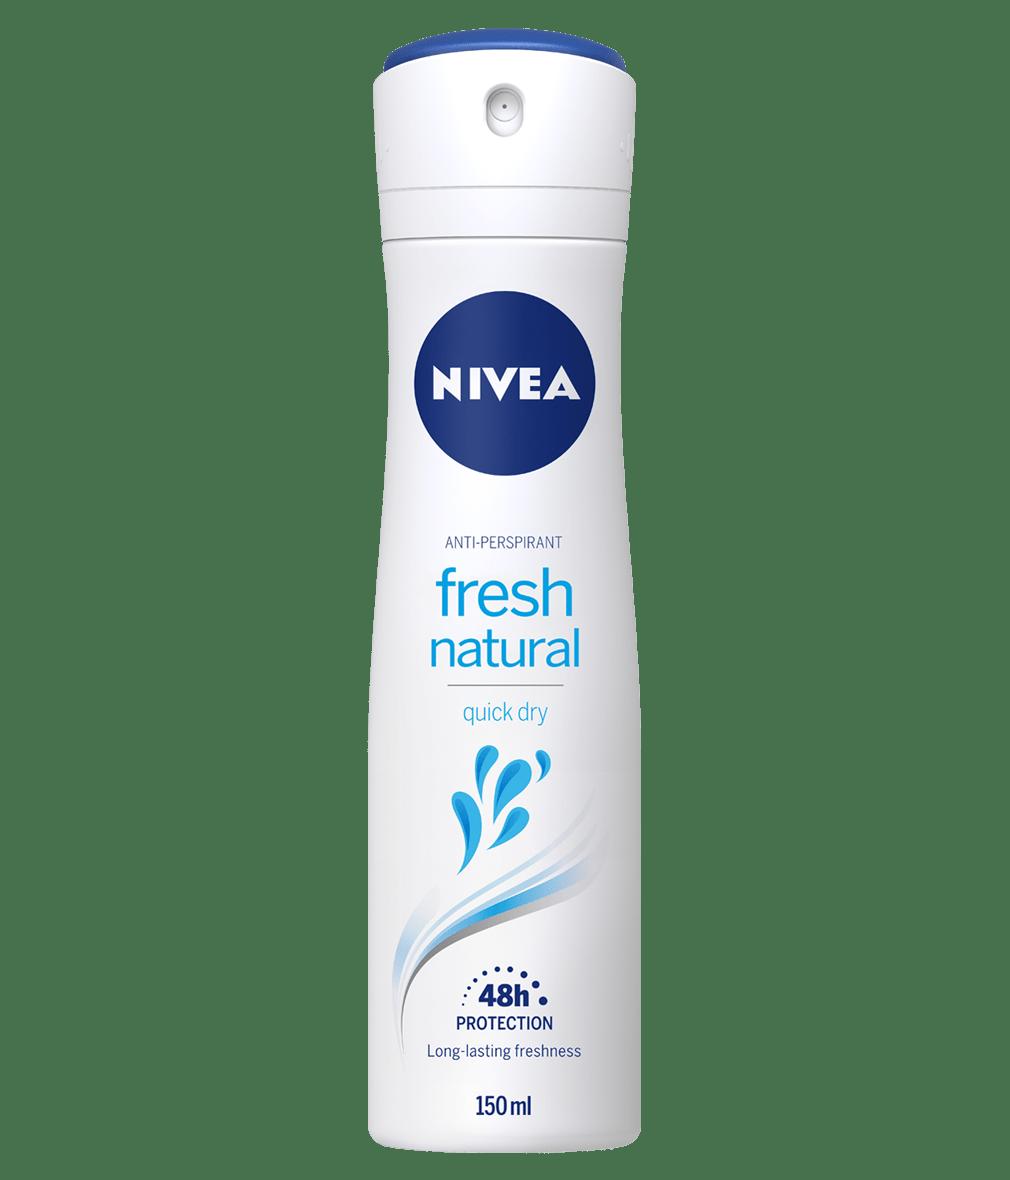 Fresh Natural Deodorant Spray   Anti-Perspirant   NIVEA